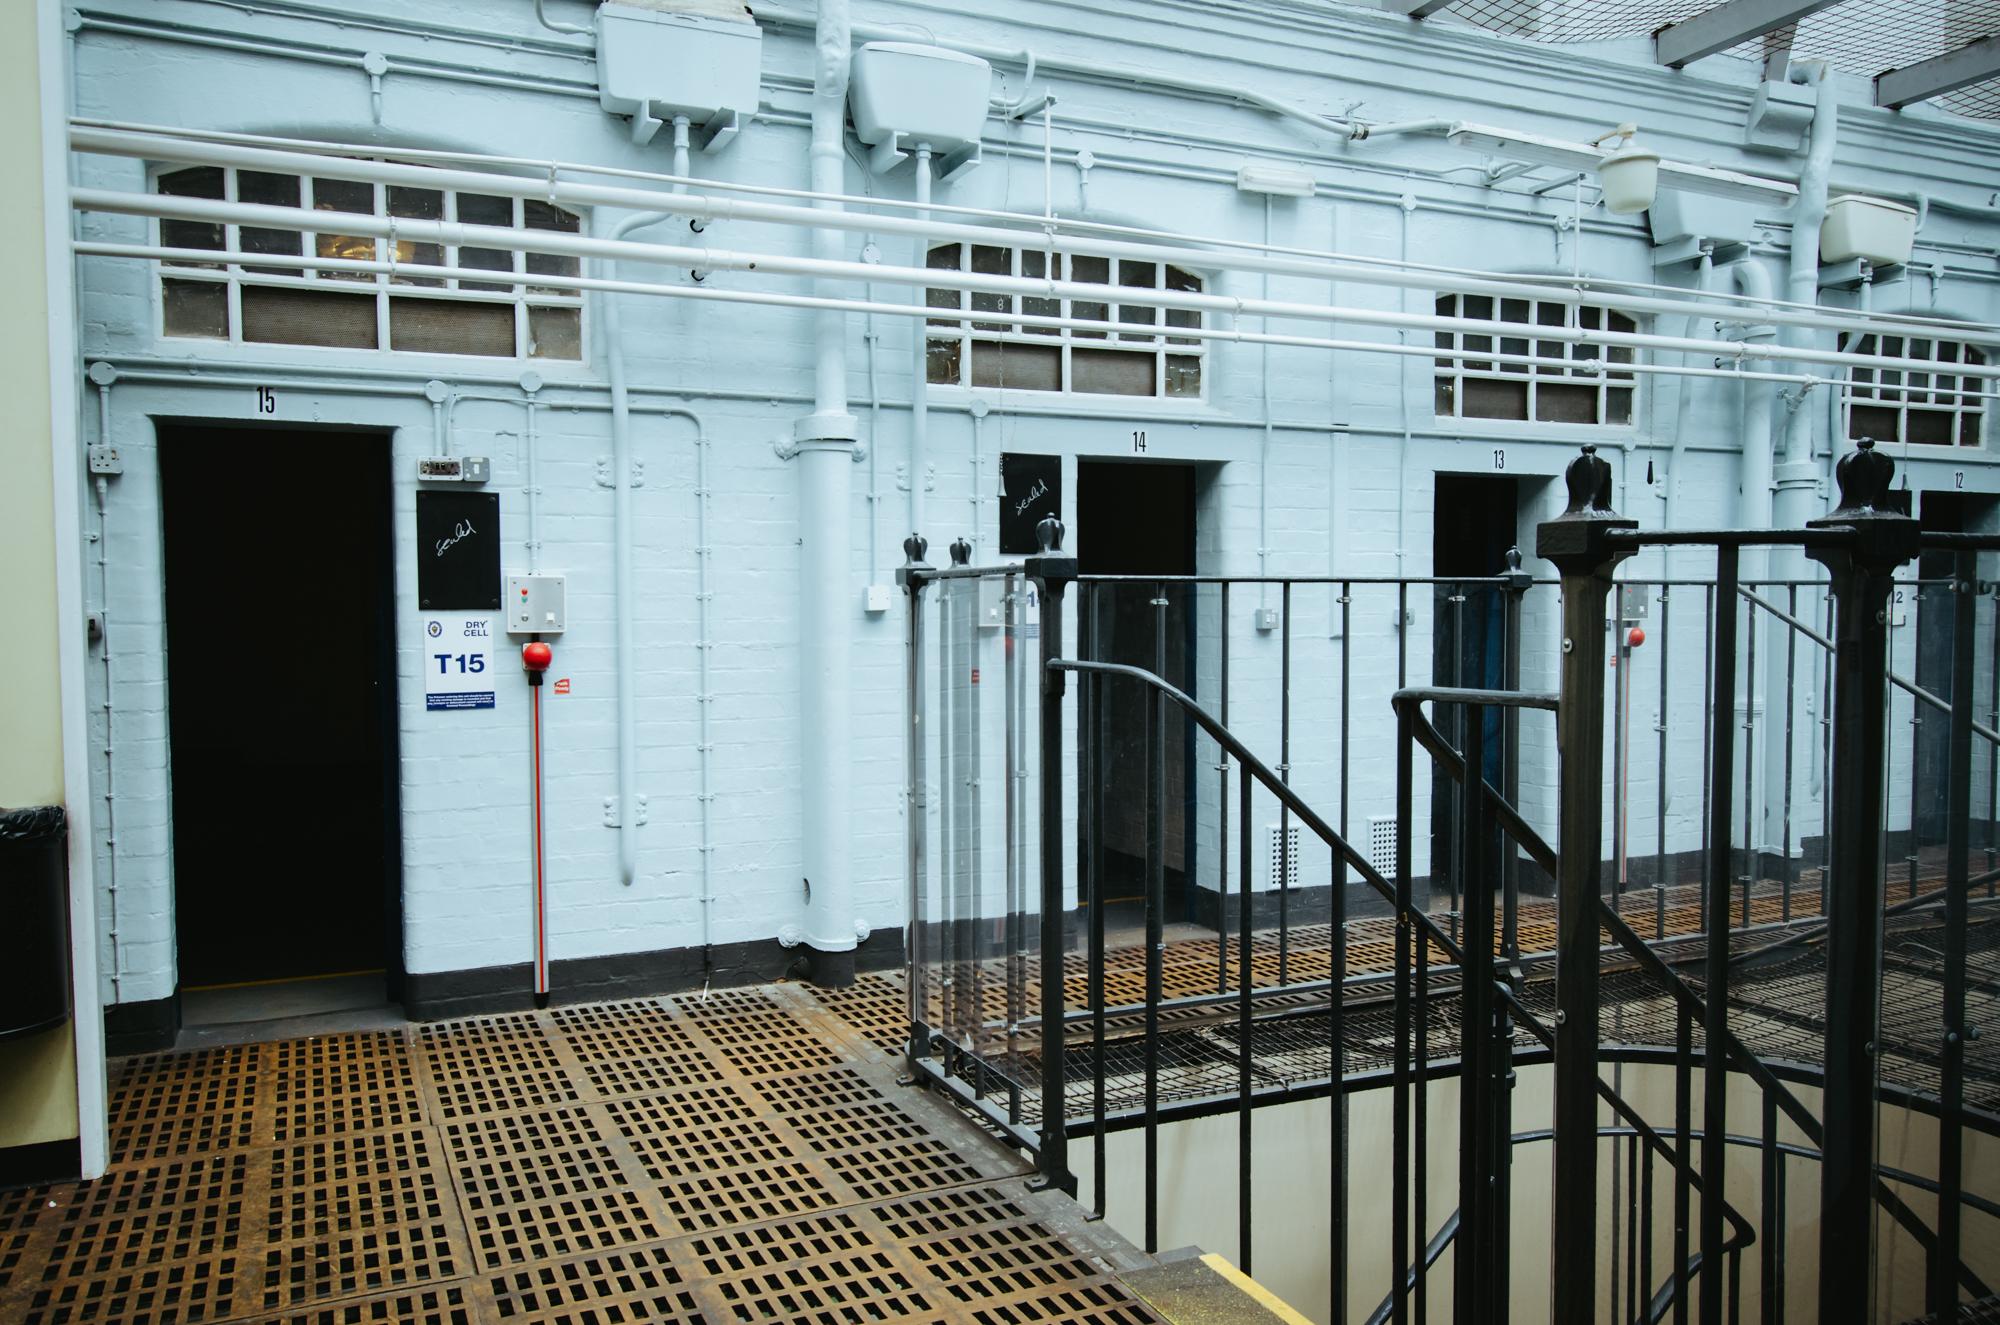 Steelhouse-Lane-Lock-Up-Birmingham-Hanny-Foxhall-_DSC2534.jpg